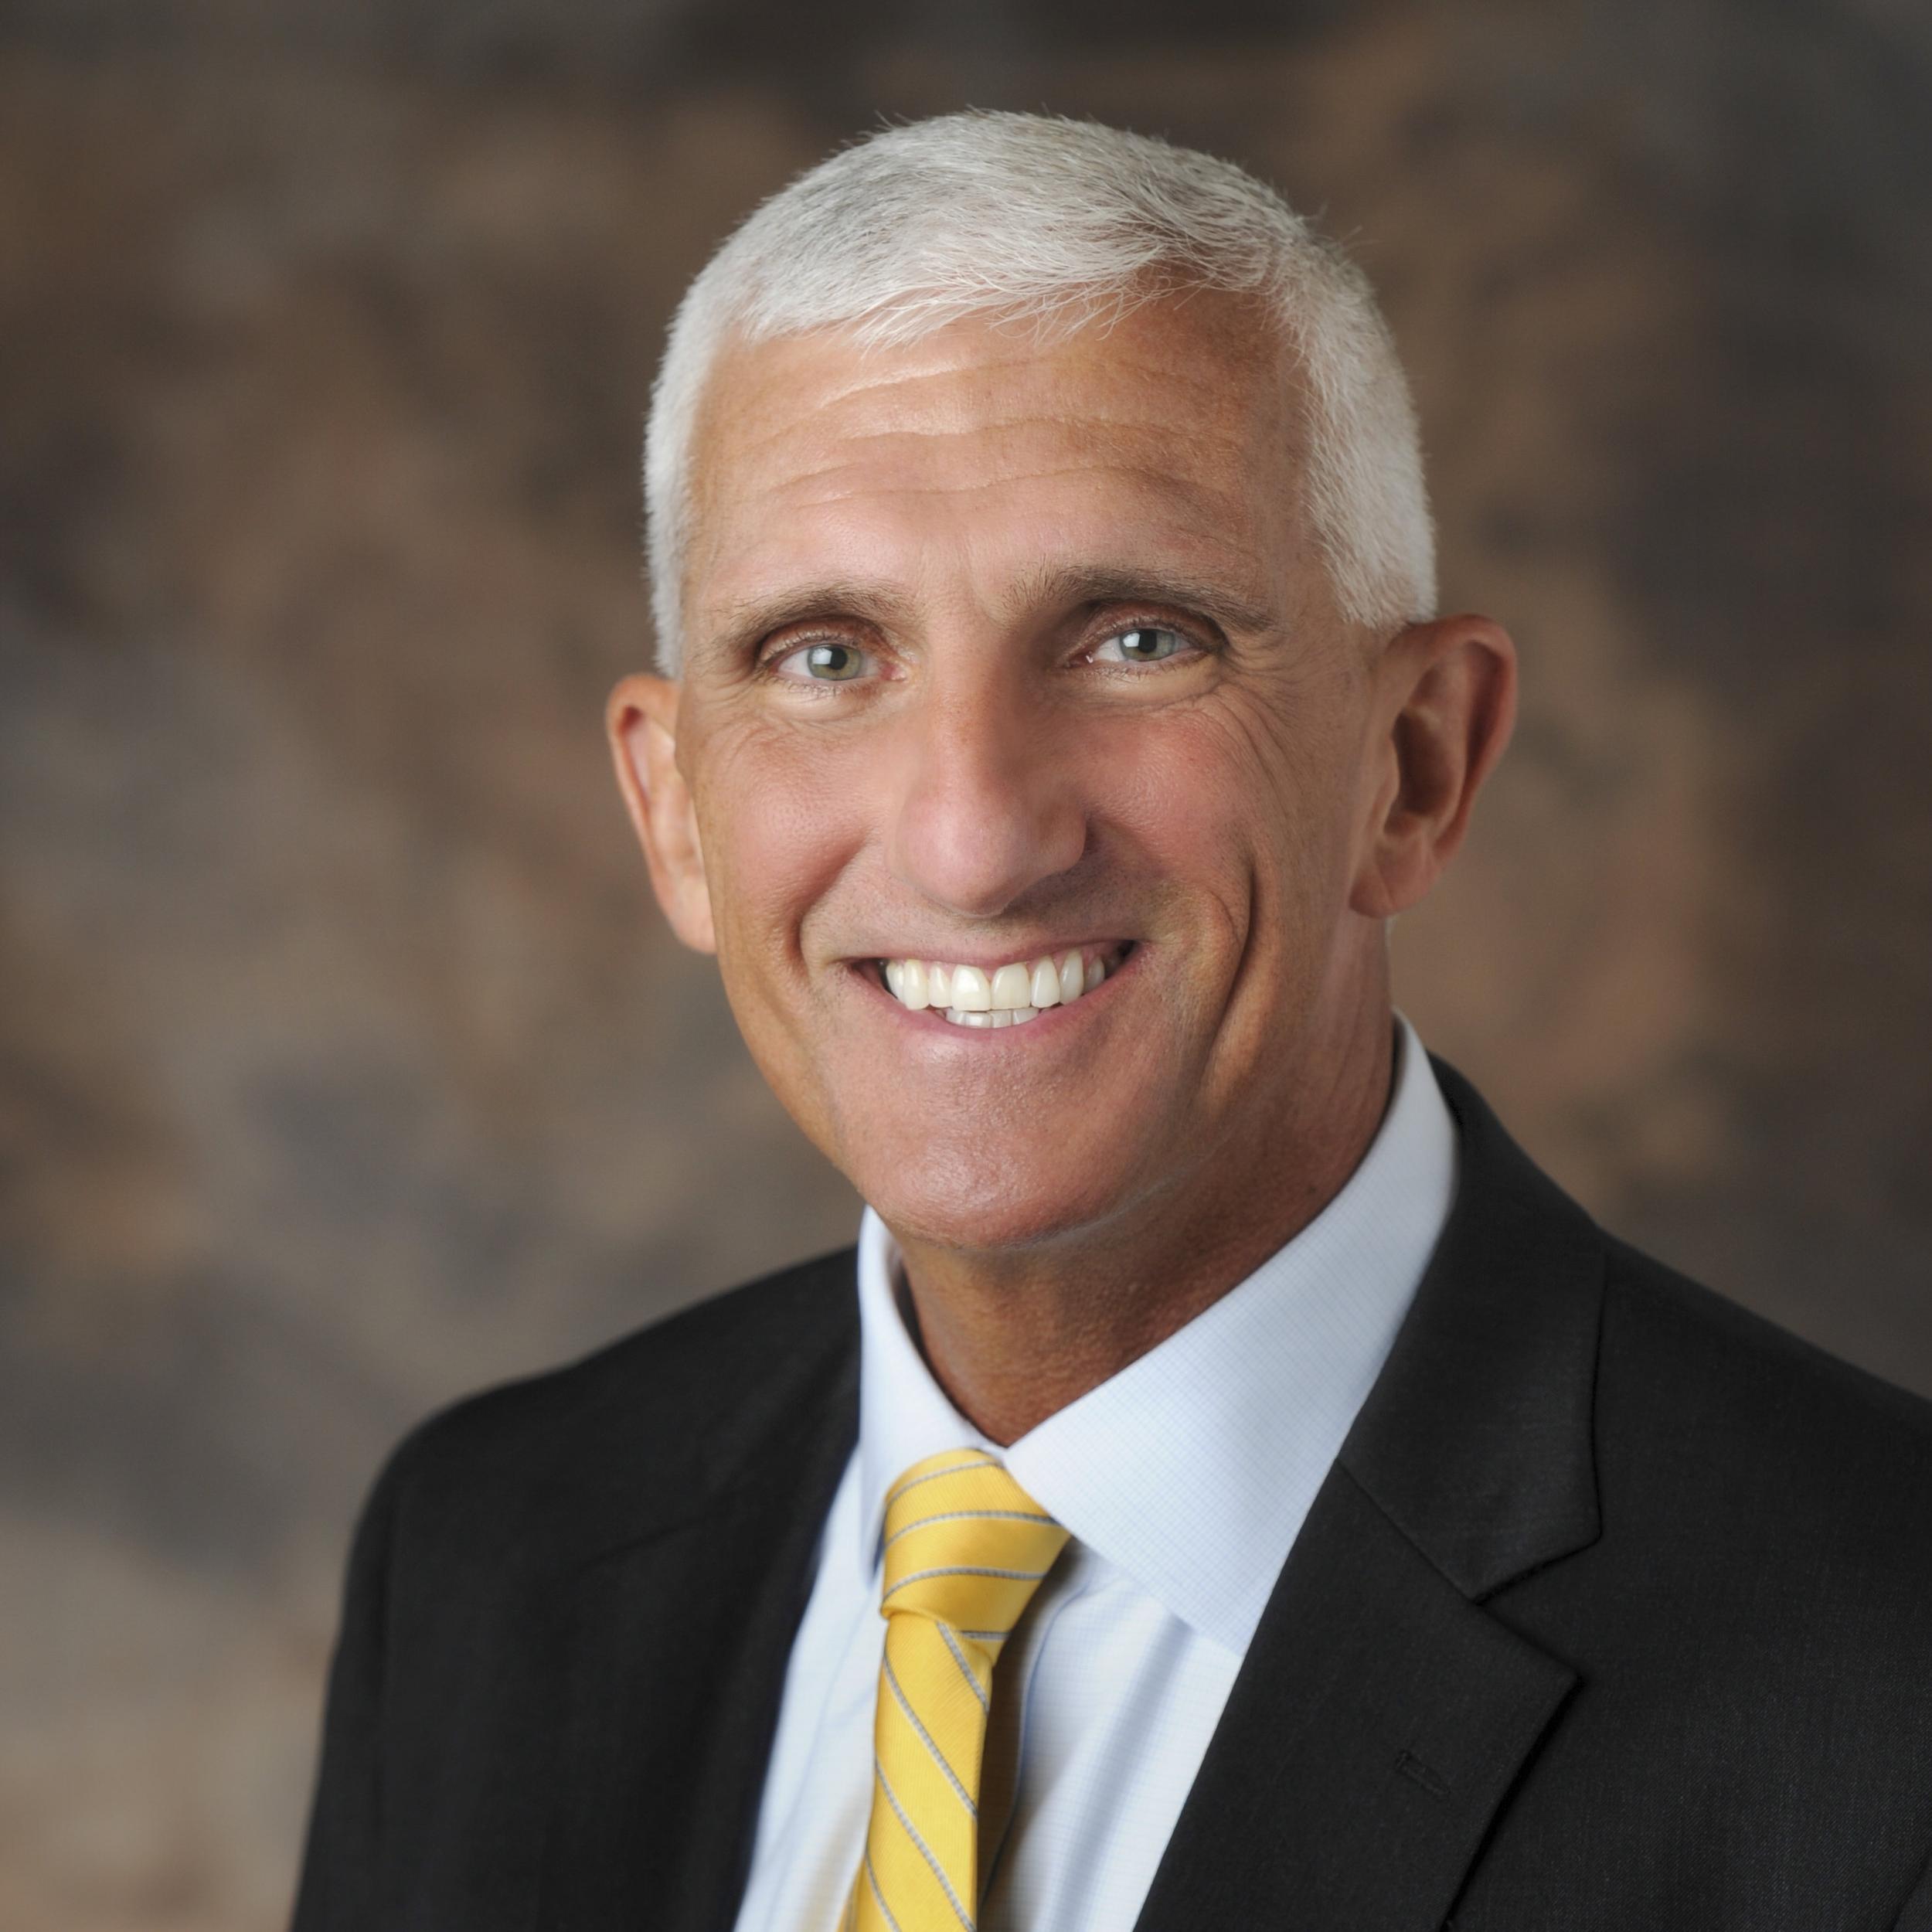 Lieutenant General (retired) Mark Hertling  Senior Vice President at the innovative Florida Hospital in Orlando from 2013-2017